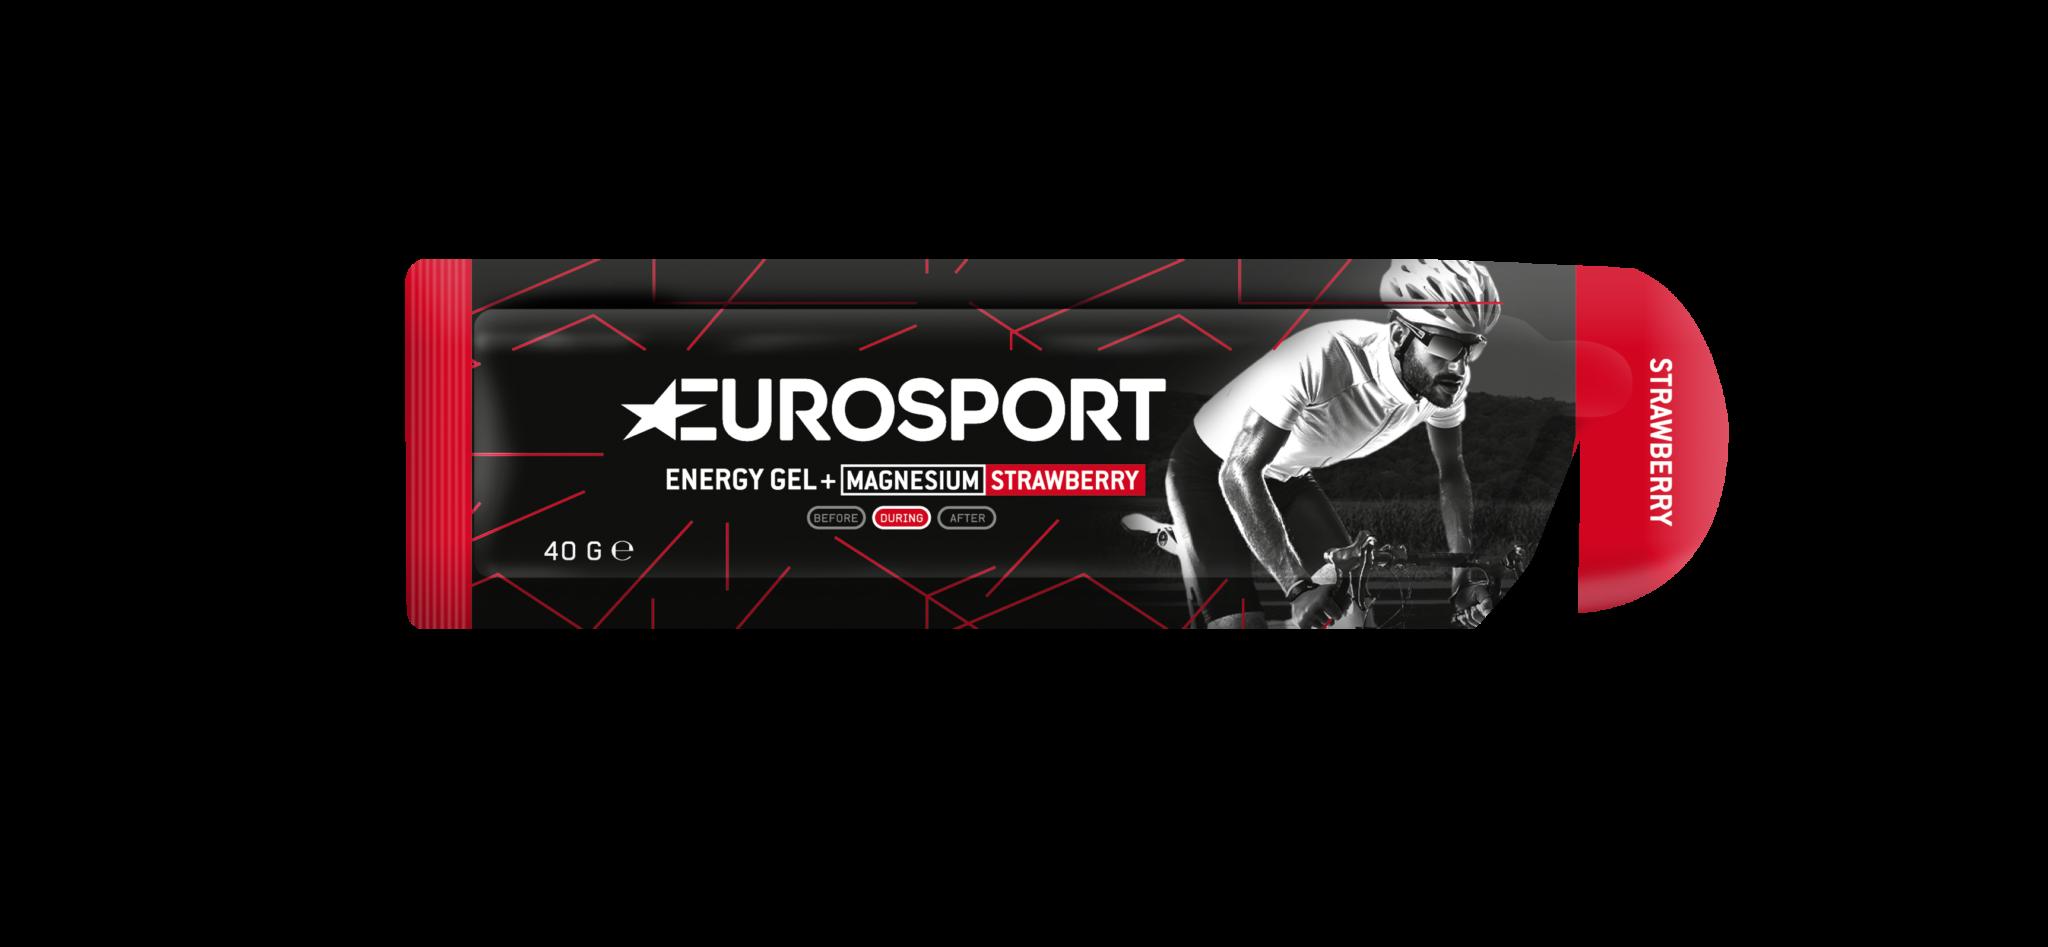 Eurosport - Energy Gel + Magnesium_Strawberry_3D